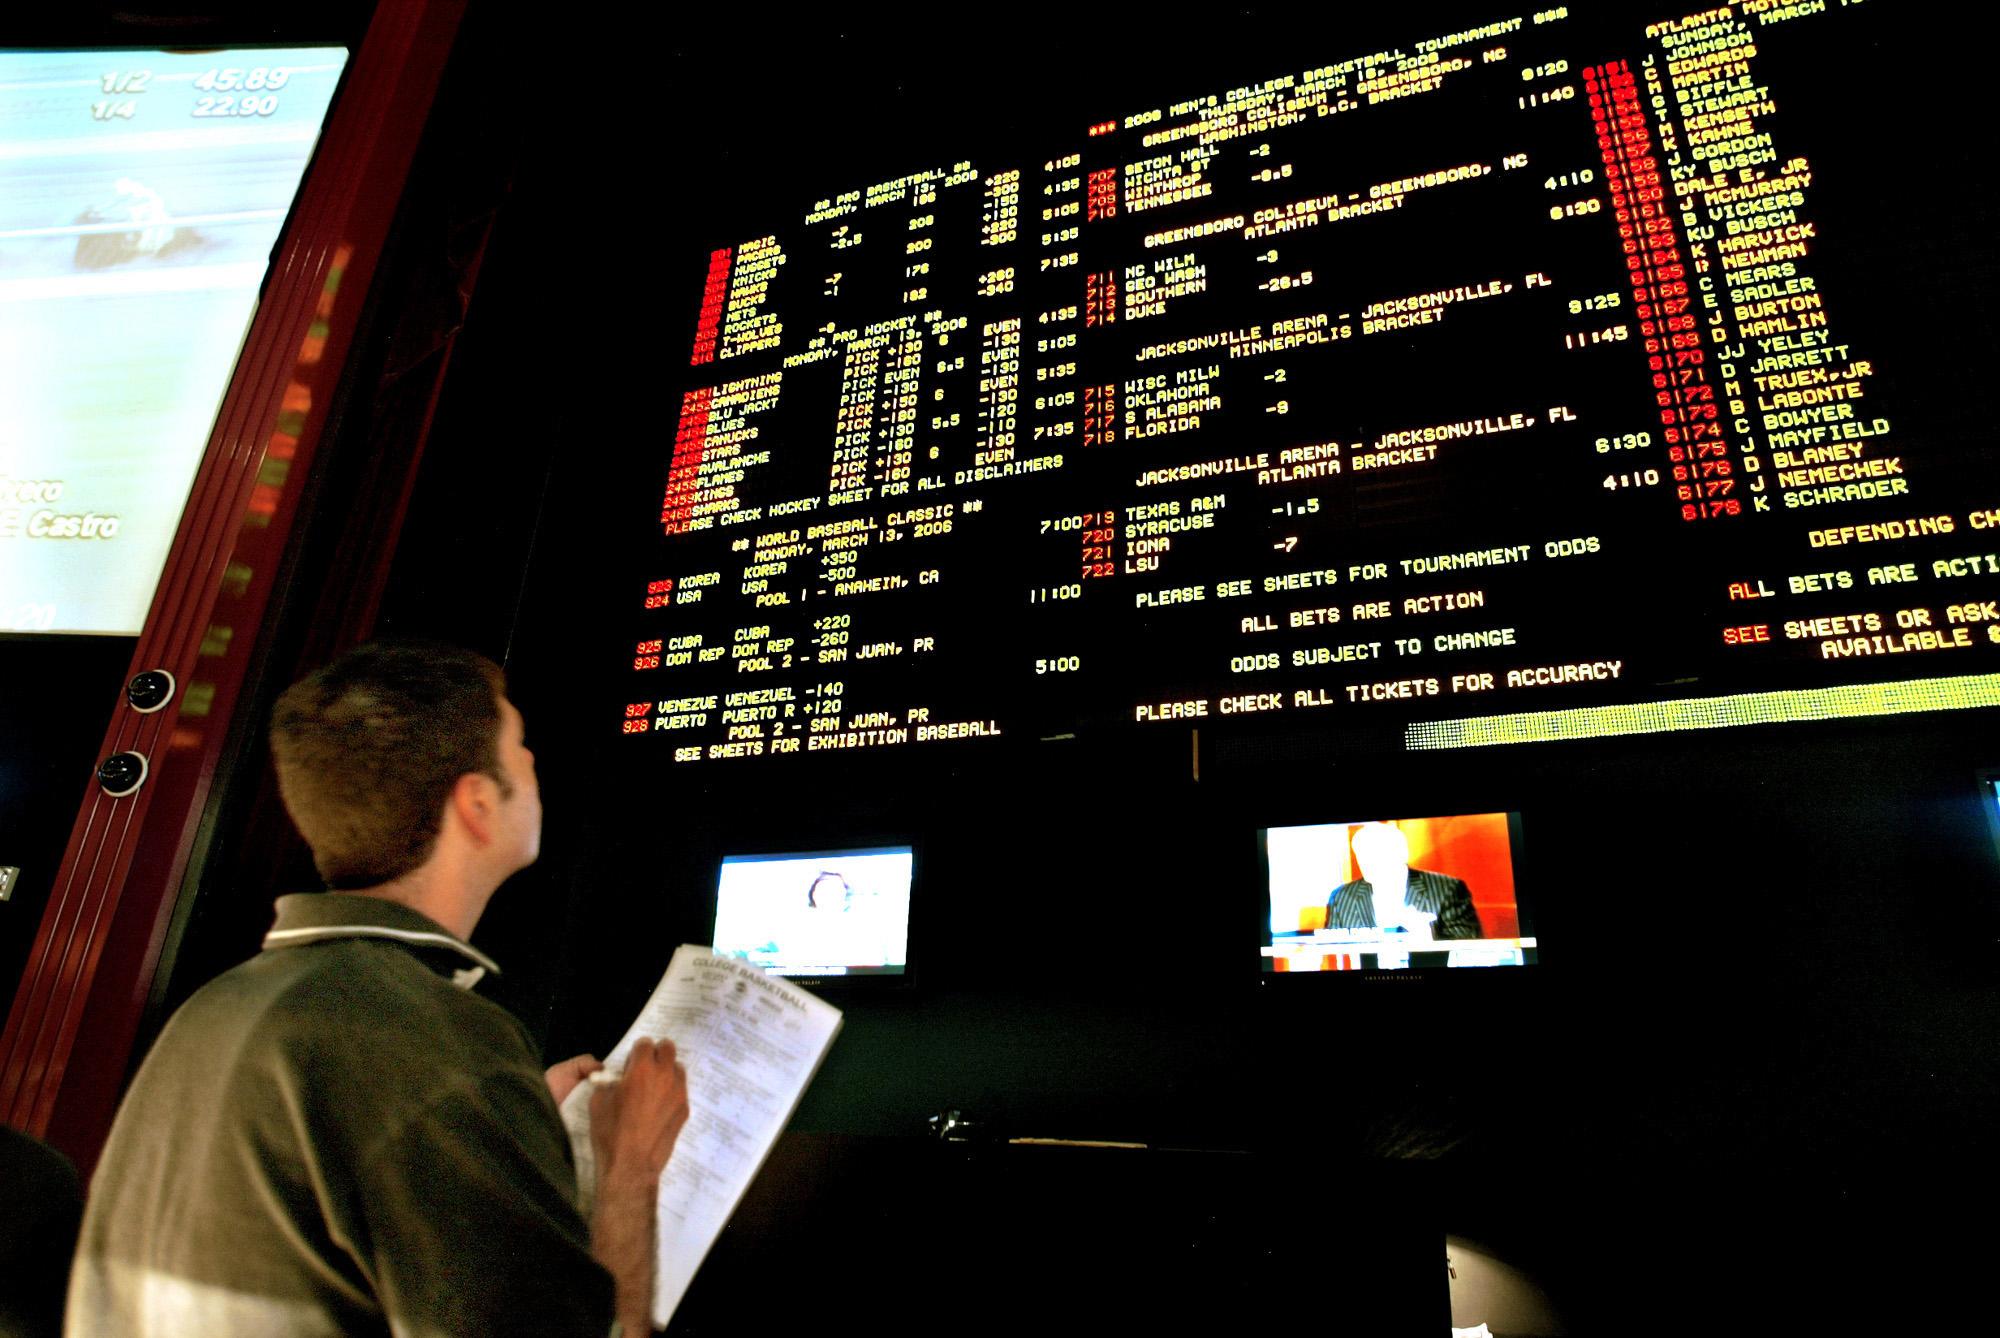 Legal Sports Betting 32470